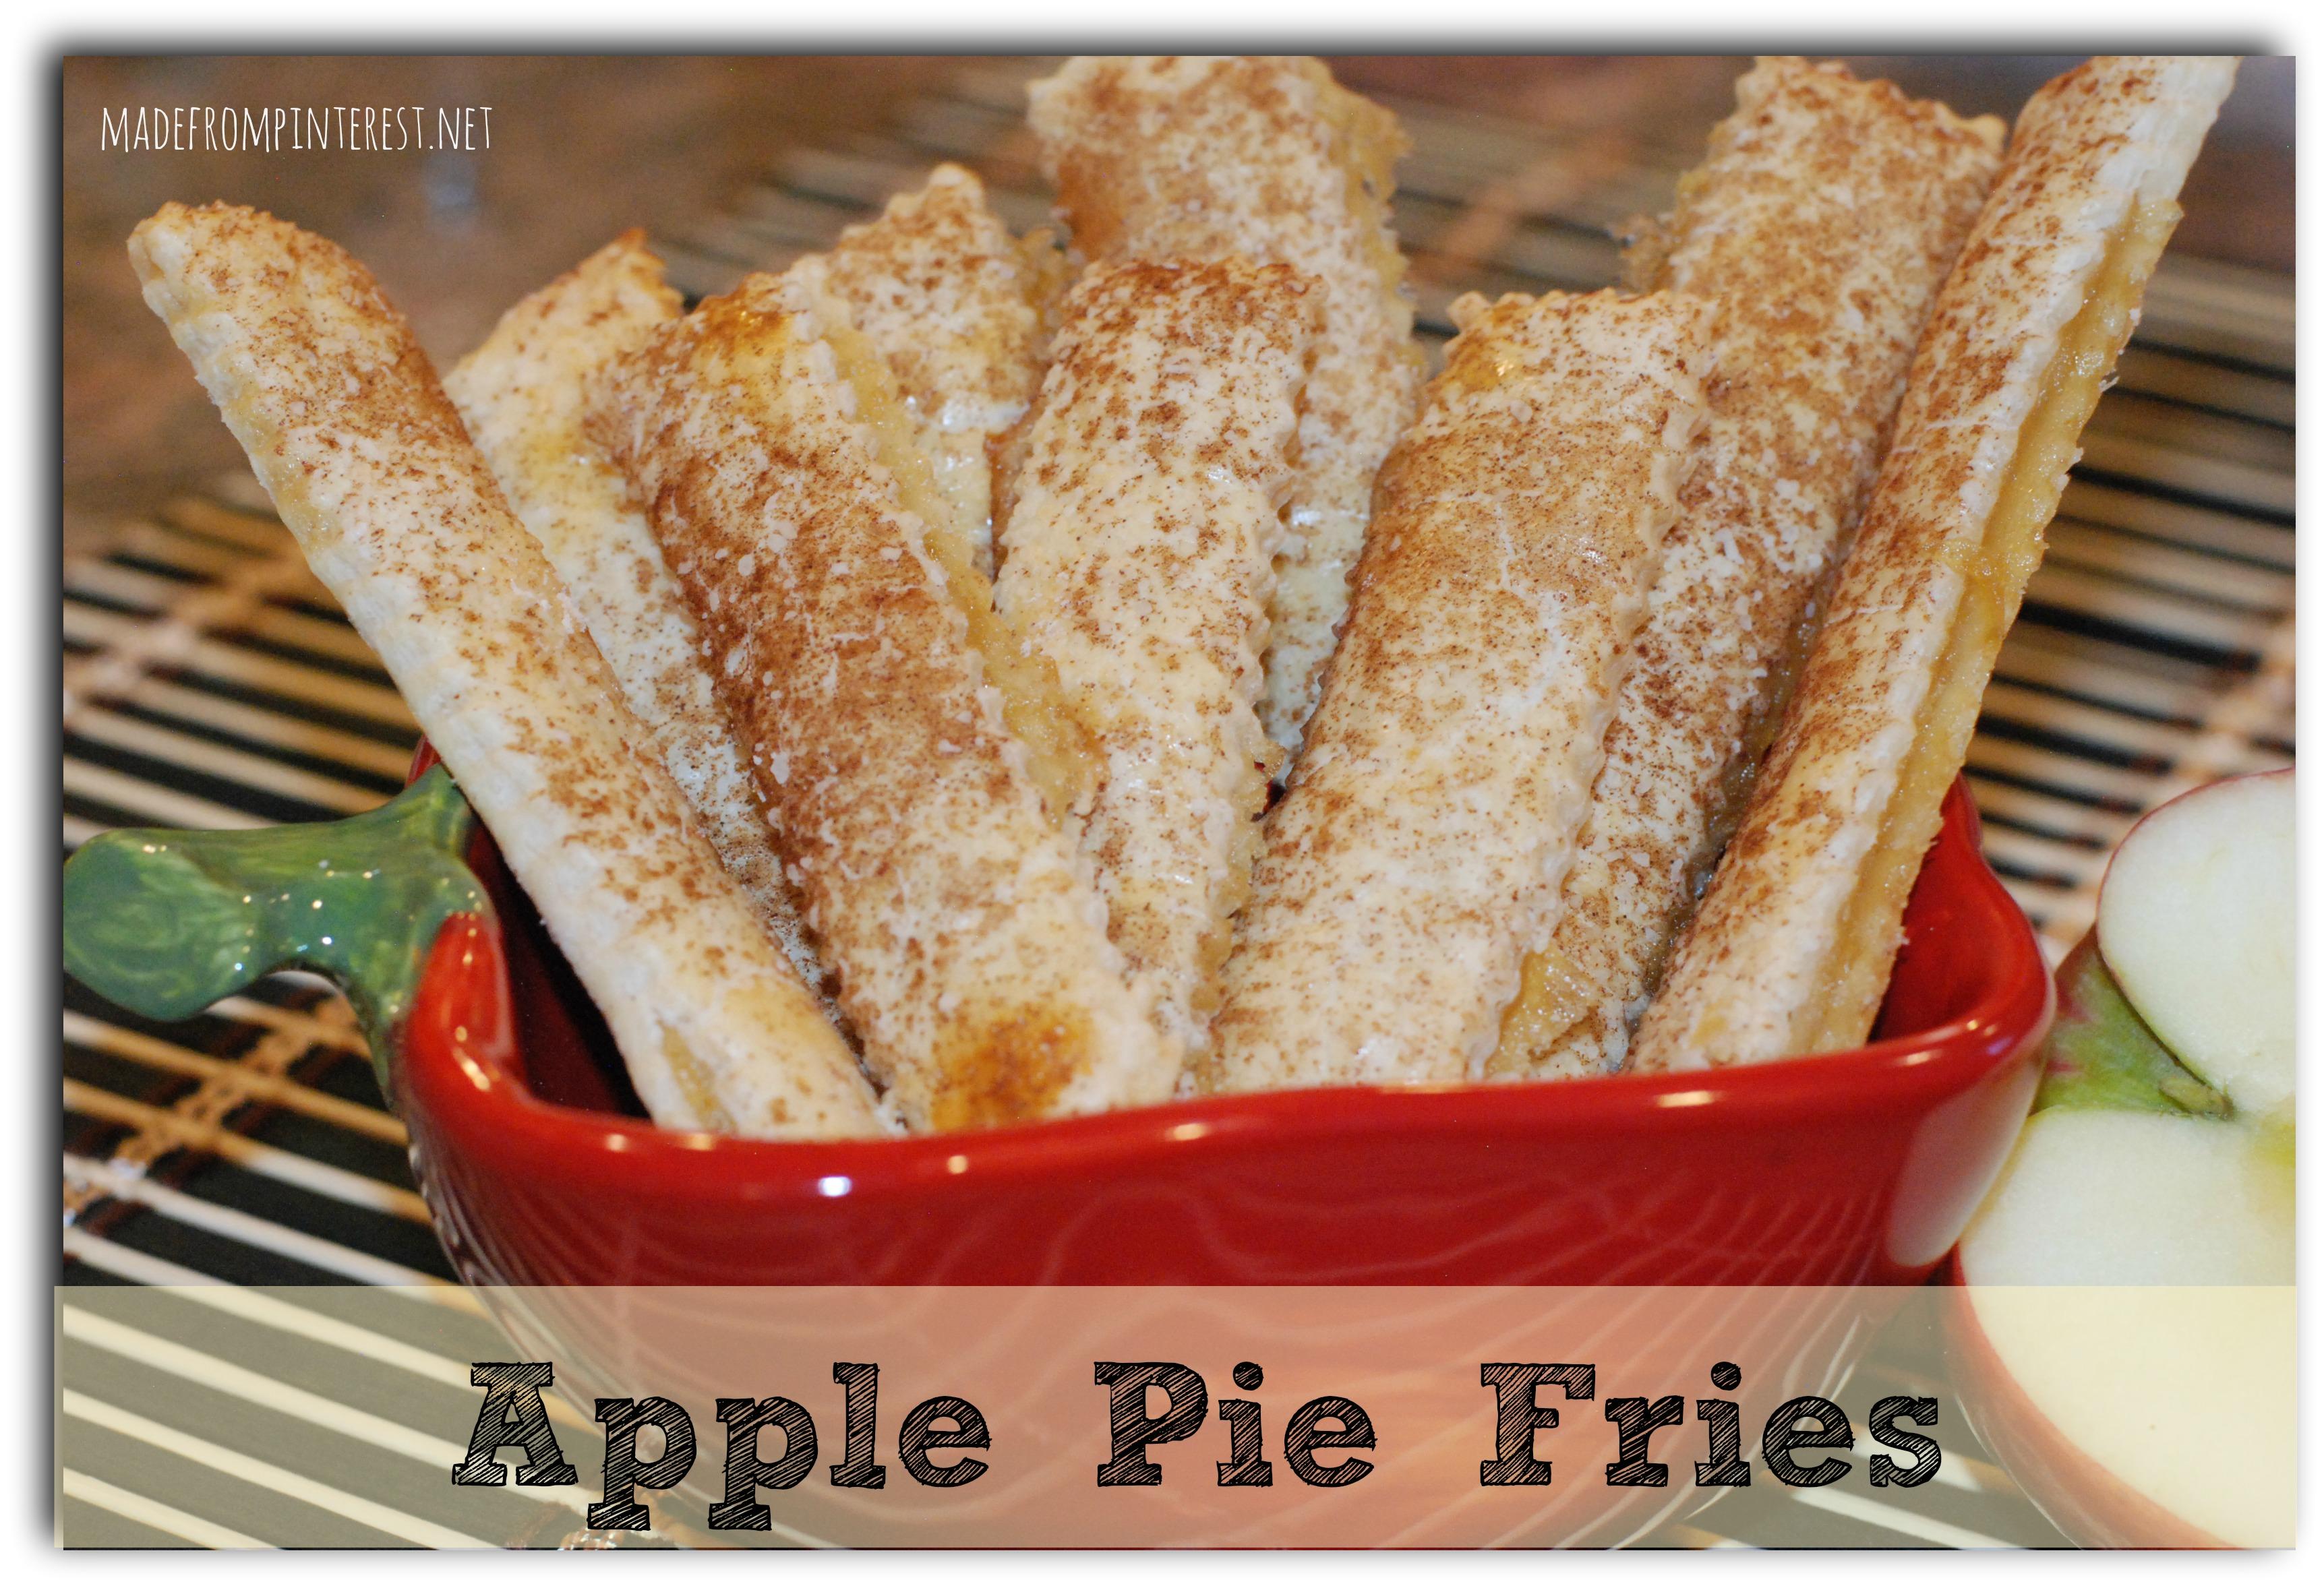 Apple Pie Fries - TGIF - This Grandma is Fun